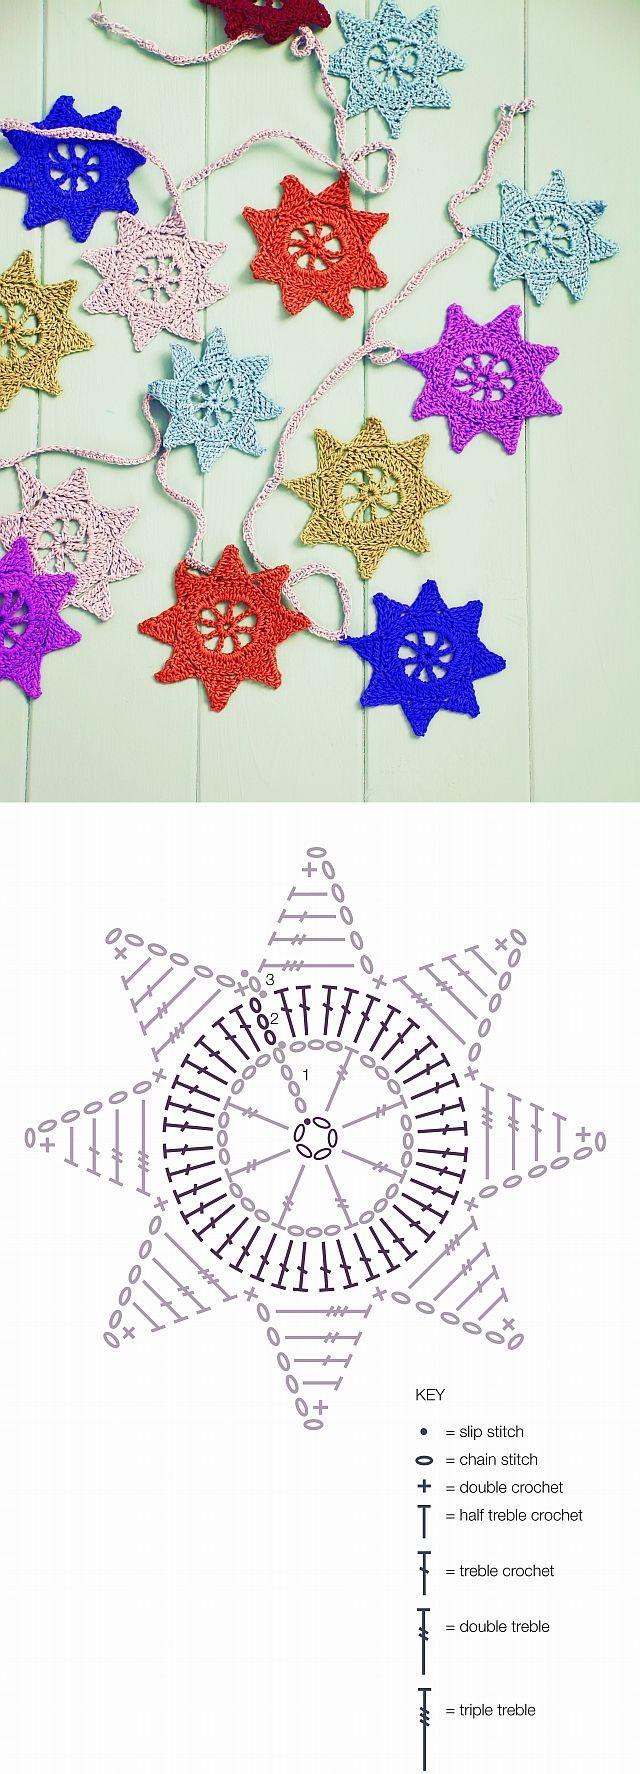 8-Point Crochet star motif; REGINA RECEITAS DE CROCHE E AFINS: esquema estrela.